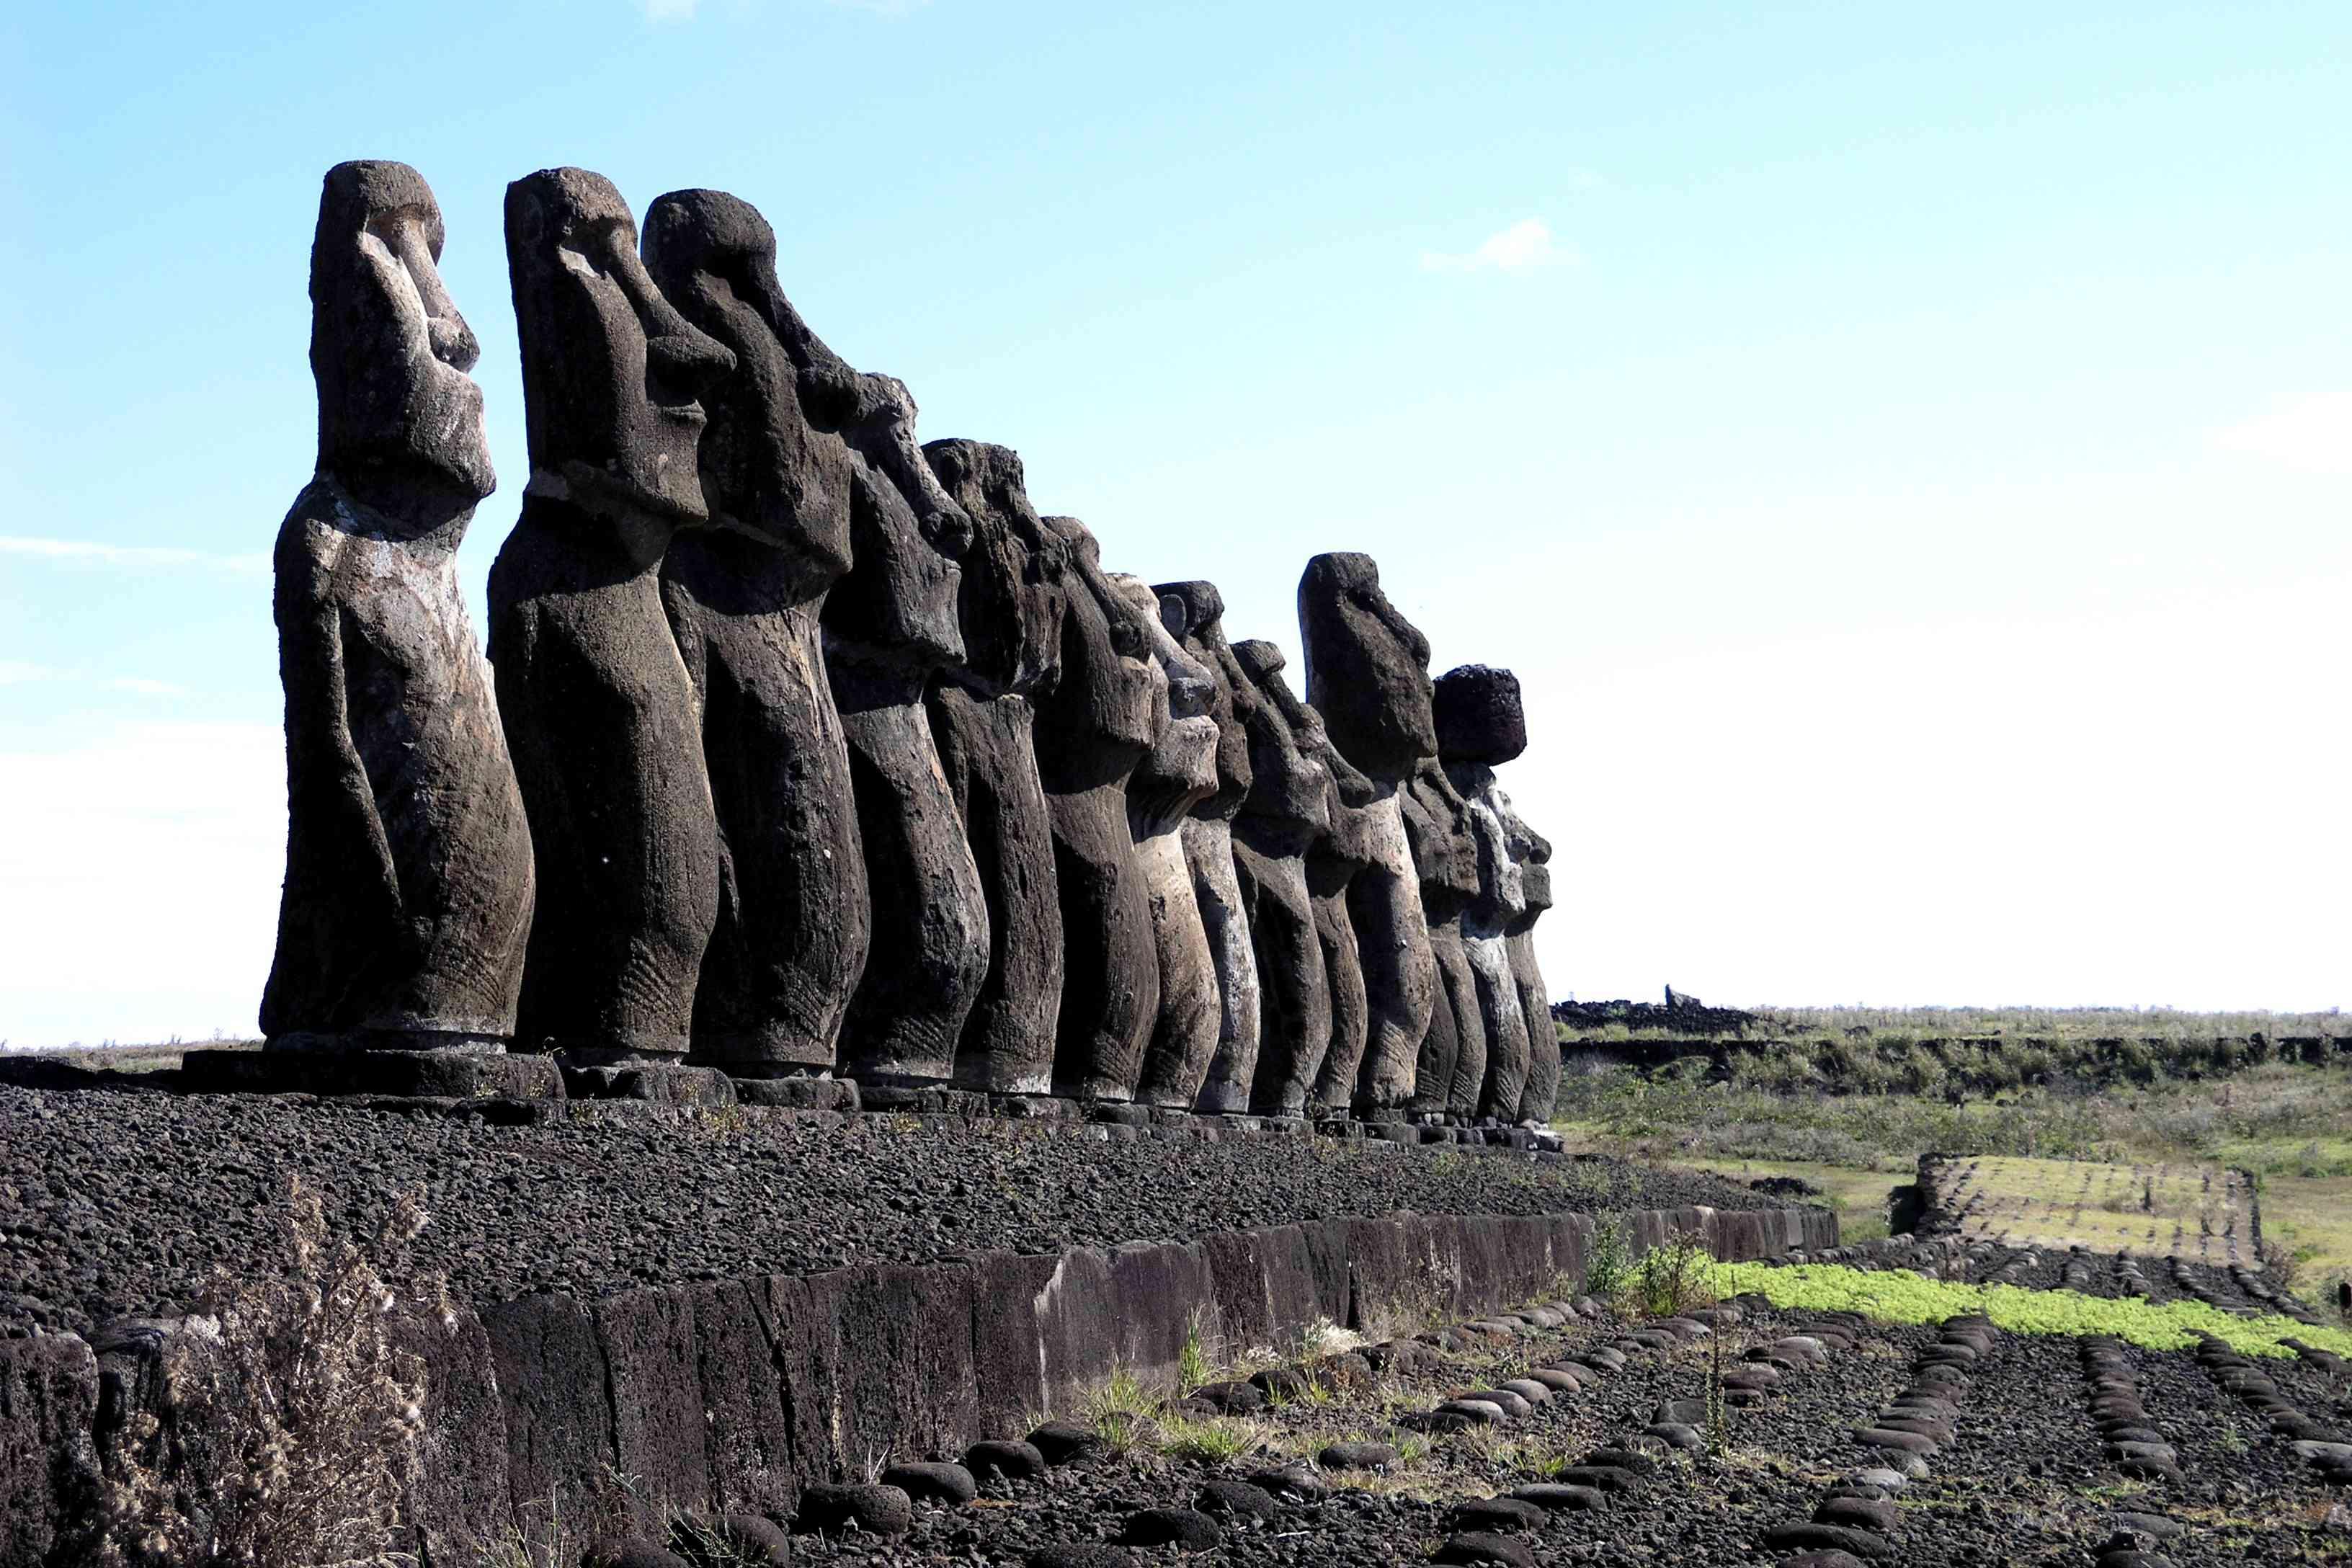 Ahu Tongariki, the largest group of moai on Easter Island